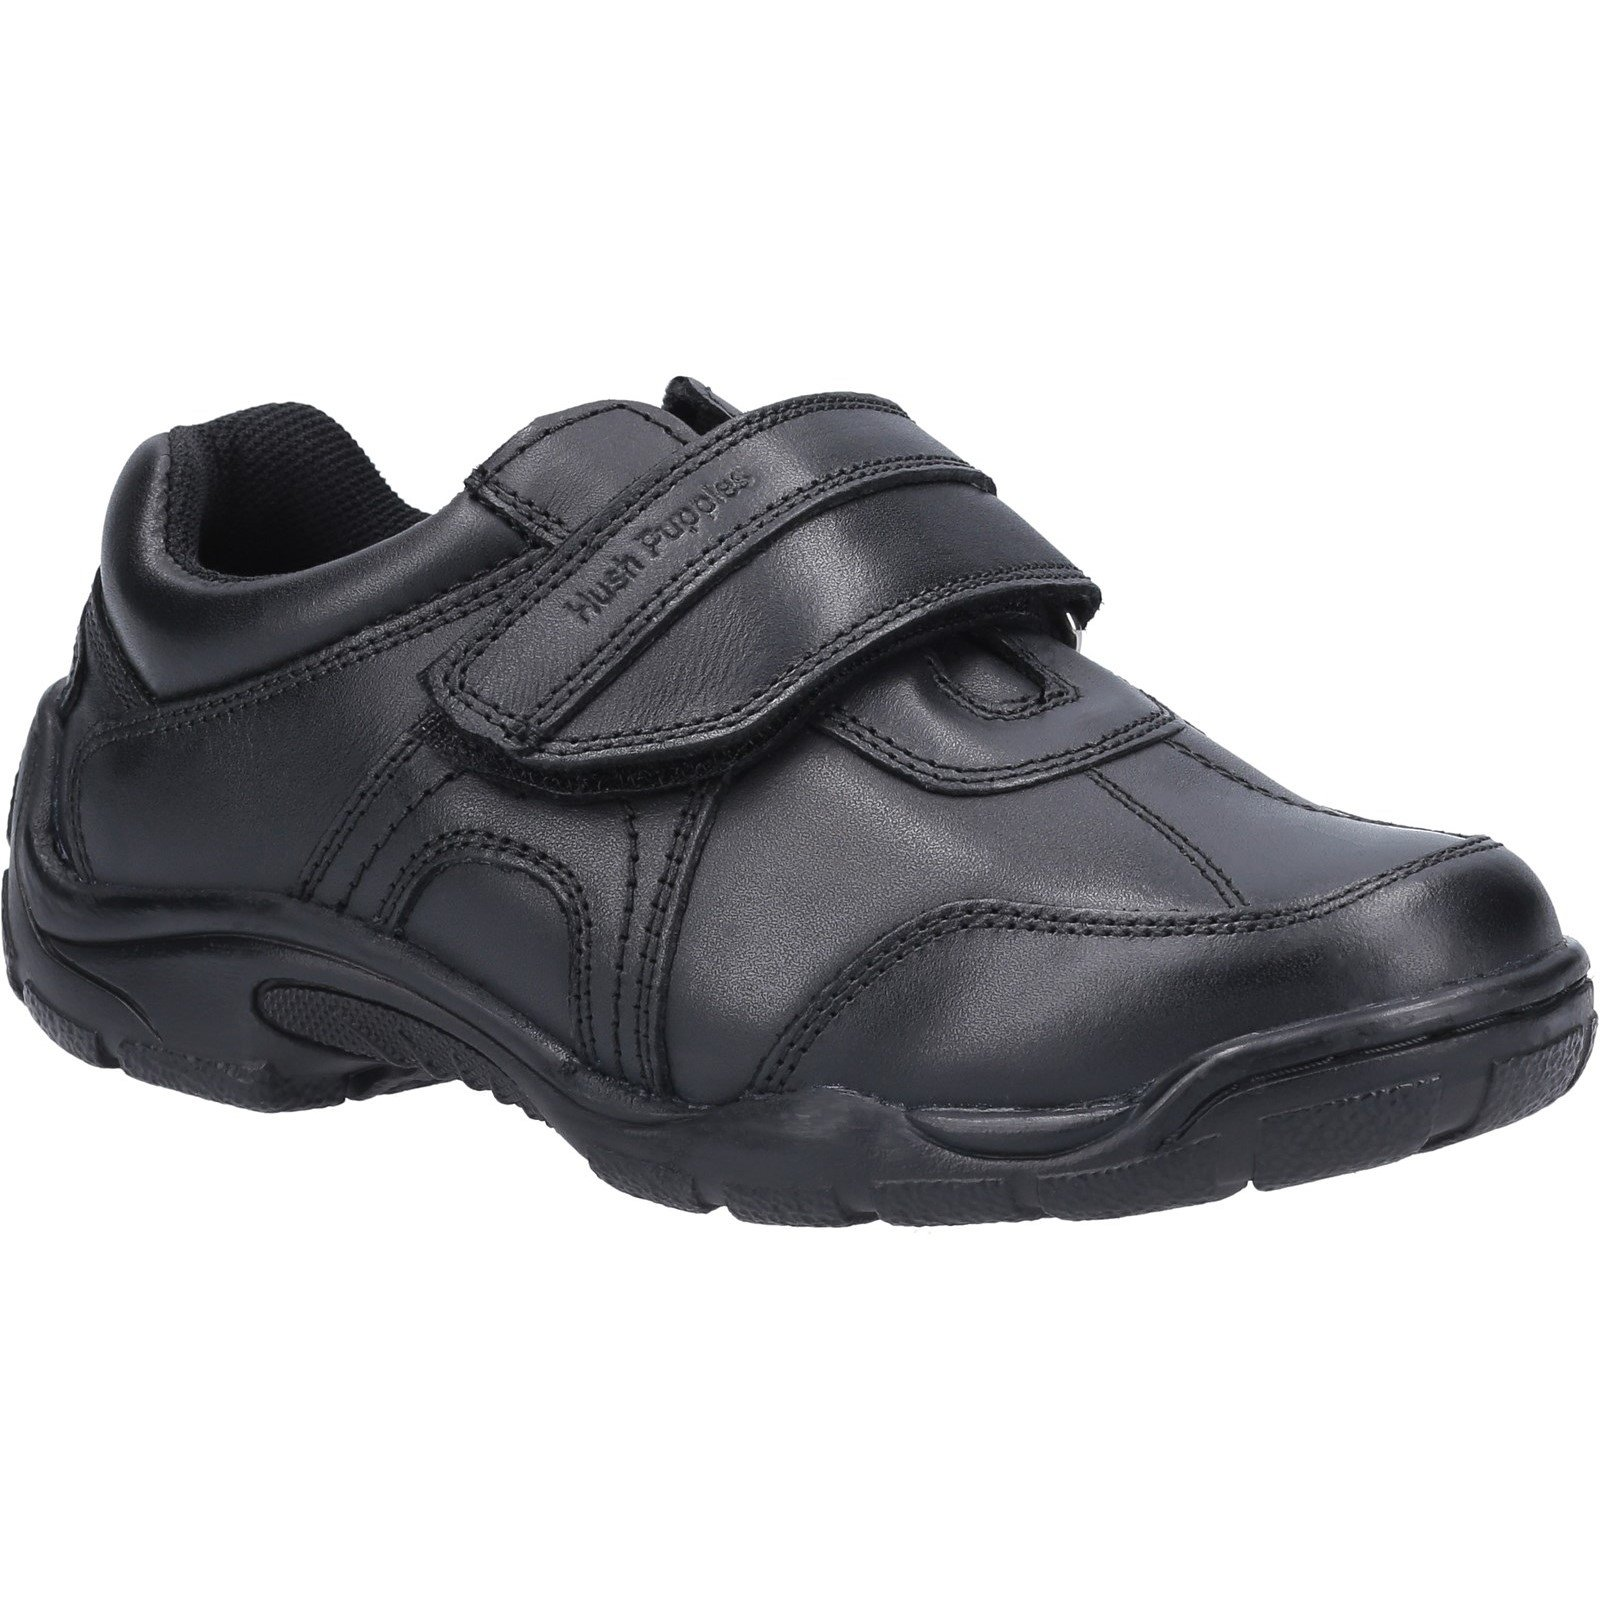 Hush Puppies Kid's Arlo Junior School Shoe Black 30853 - Black 2.5